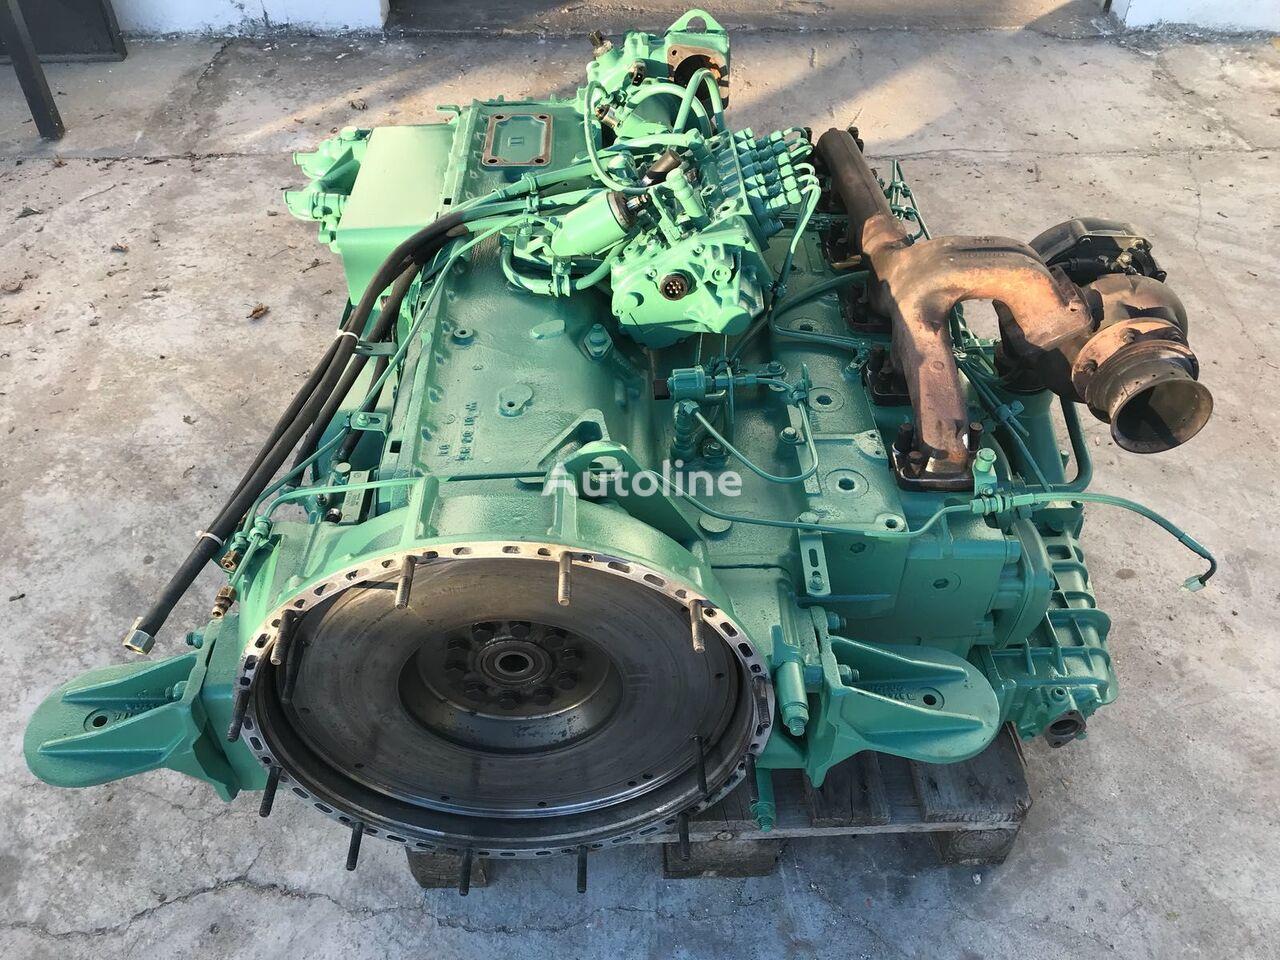 motor VOLVO THD / DH Used or Rebuild para autocarro VOLVO BUS